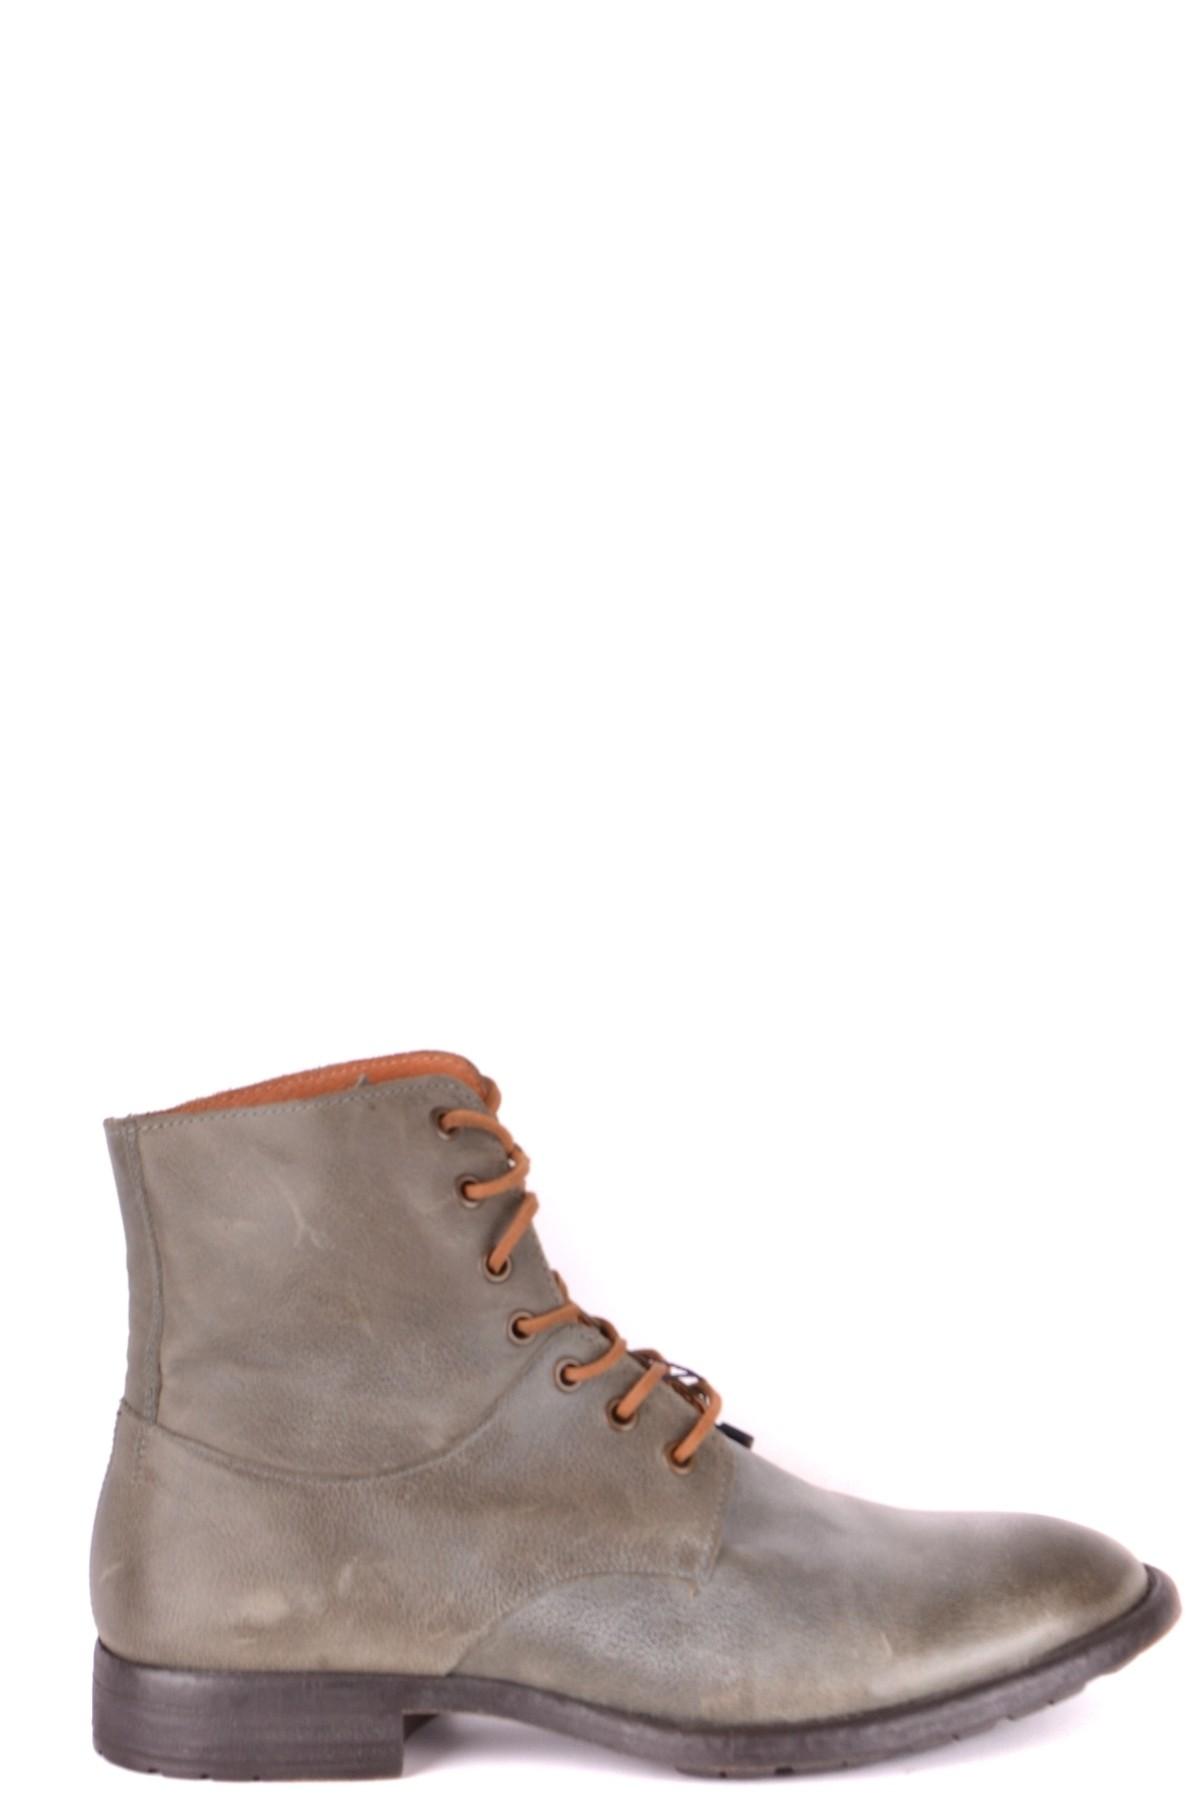 armani jeansMarchio: Armani Jeans; Genere: Uomo; Tipologia: S…